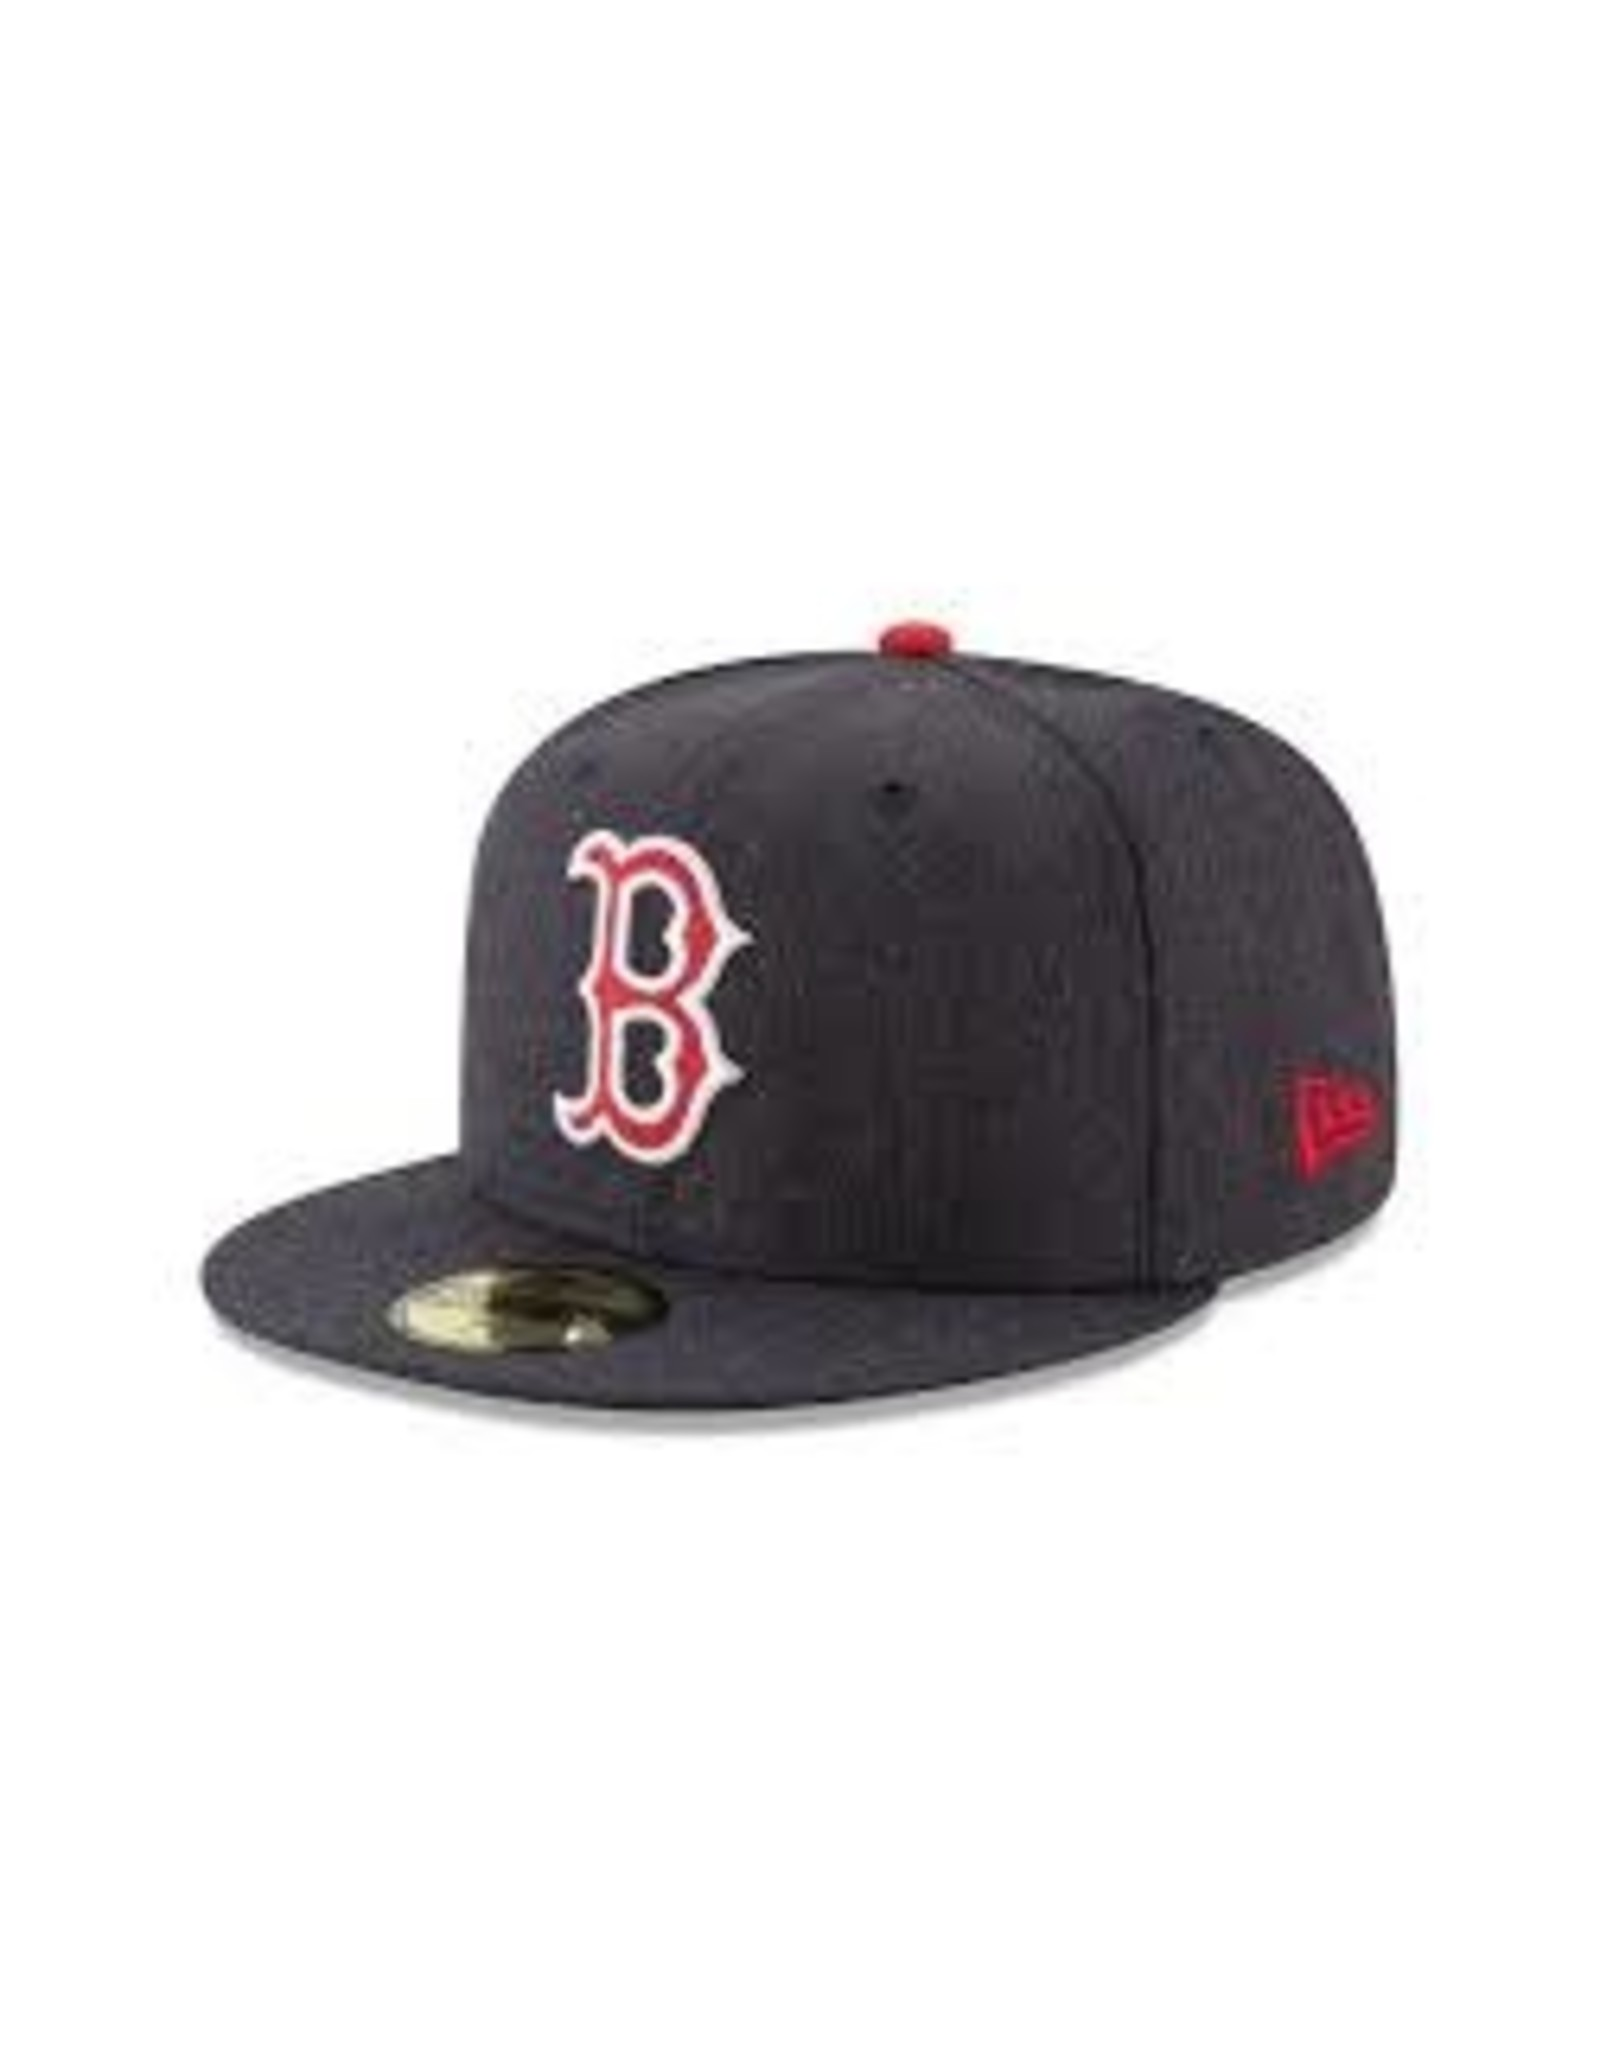 New Era New Era - Red Sox Heather Crisp 3 9FIFTY - Snapback